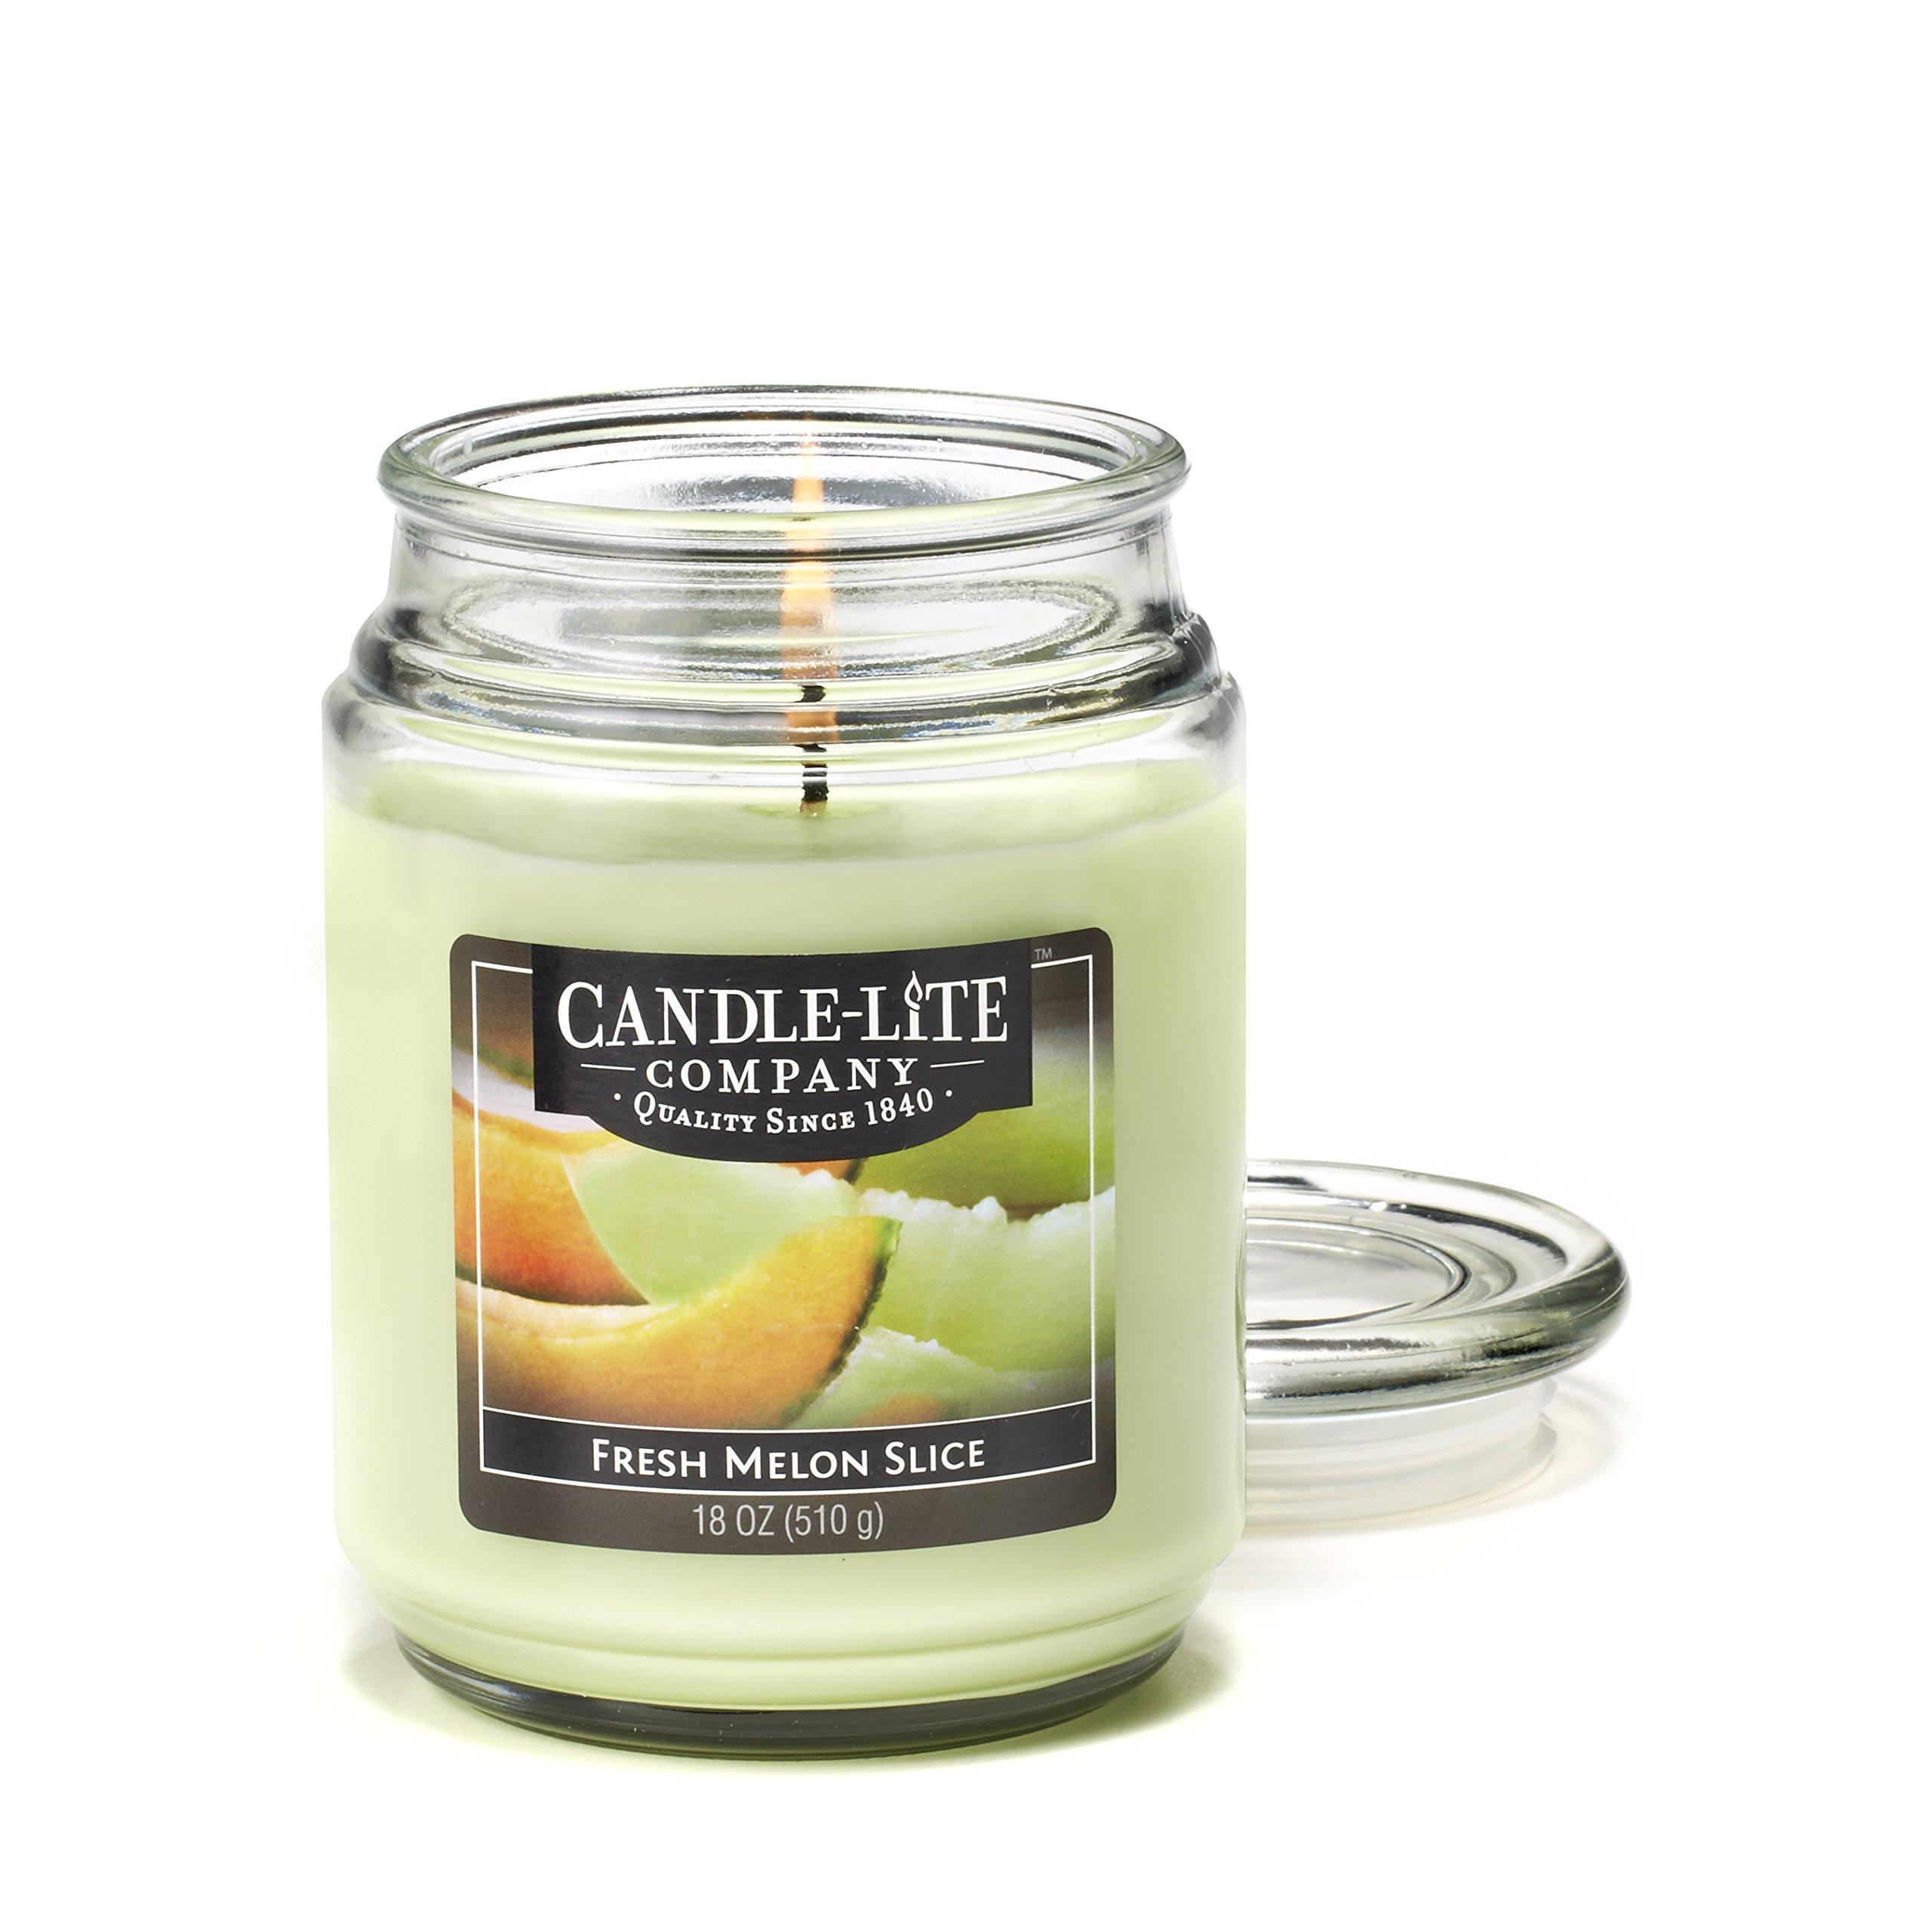 Candle-Lite Everyday Scented Fresh Melon Slice Single Wick 18oz Large Glass Jar Candle, Fruit Citrus Fragrance